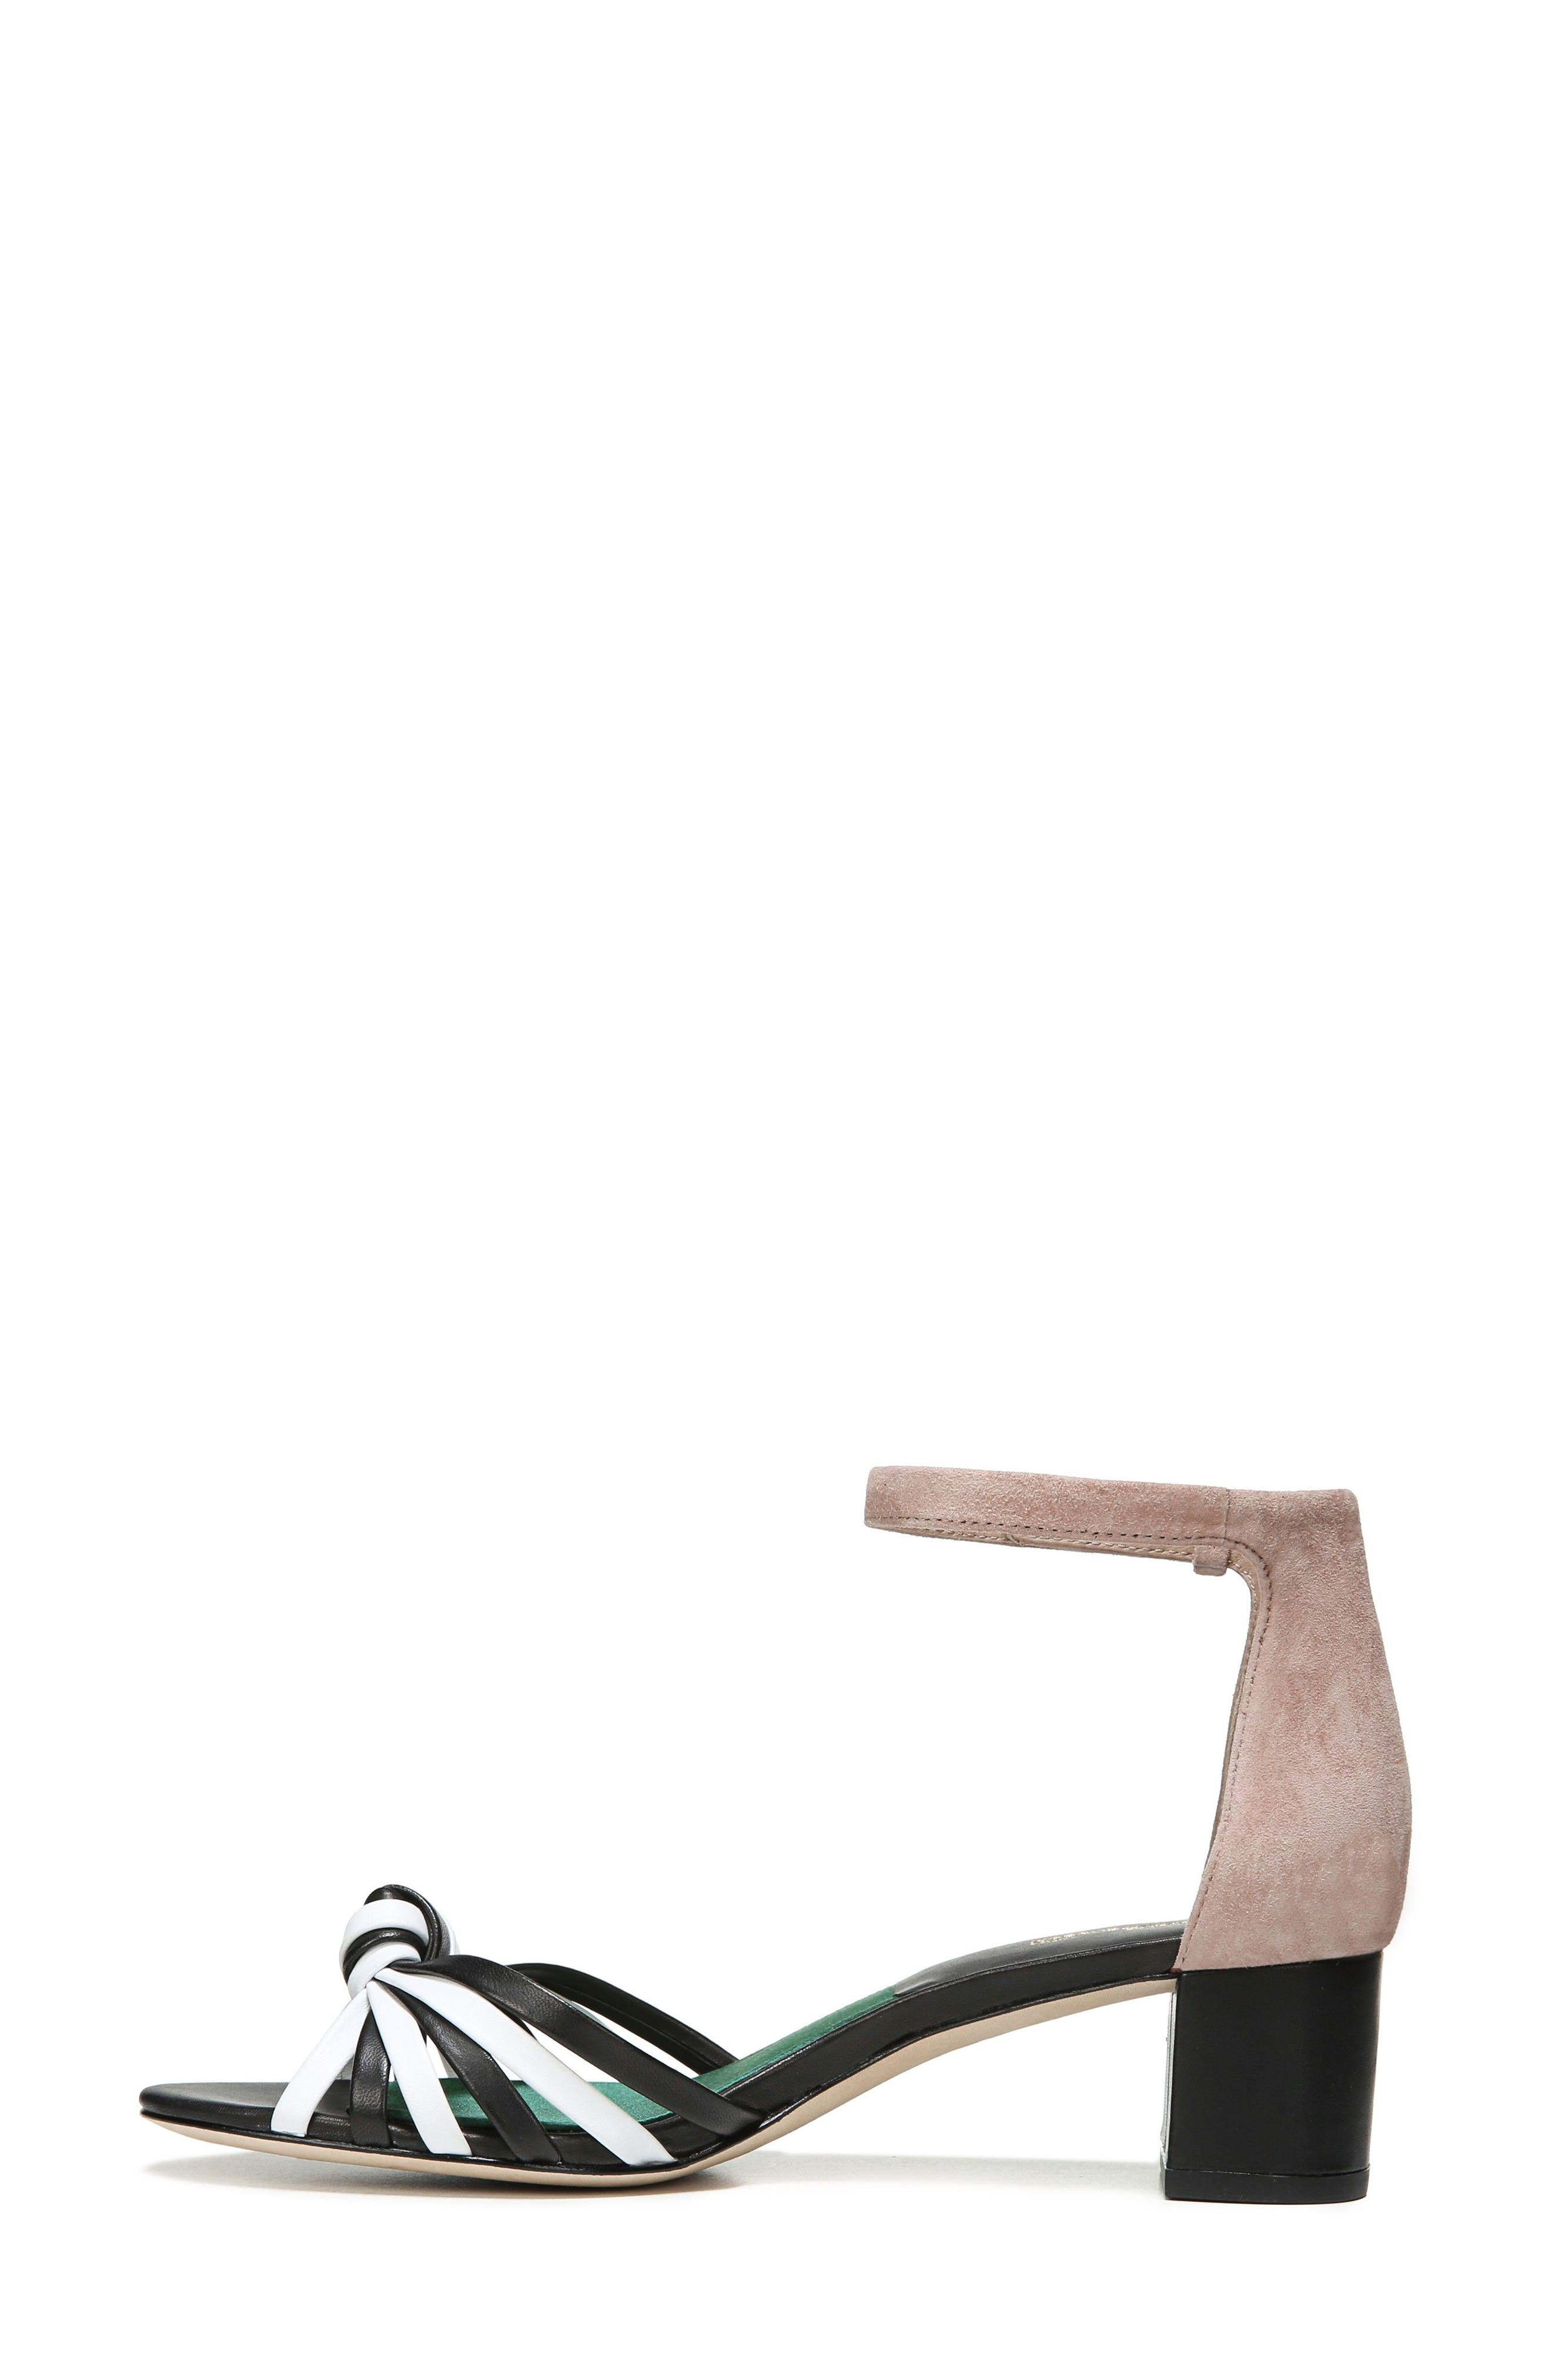 Fonseca Ankle Strap Sandal,                             Alternate thumbnail 3, color,                             001